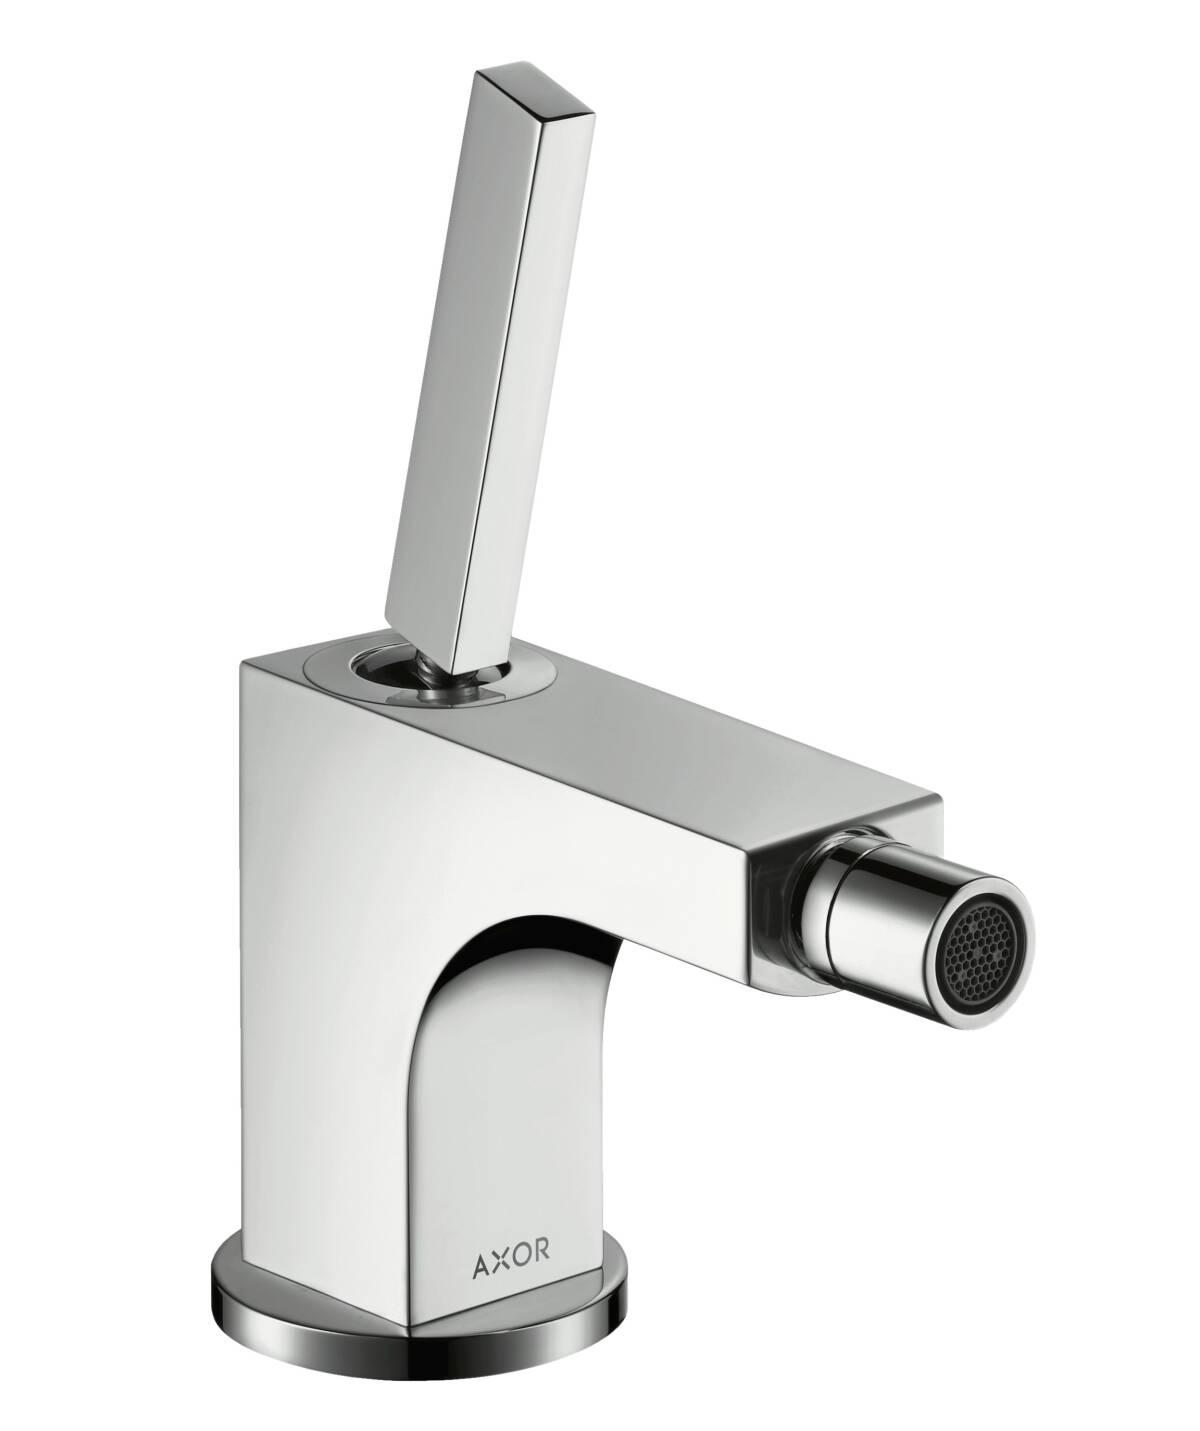 Single lever bidet mixer with pop-up waste set, Chrome, 39210000